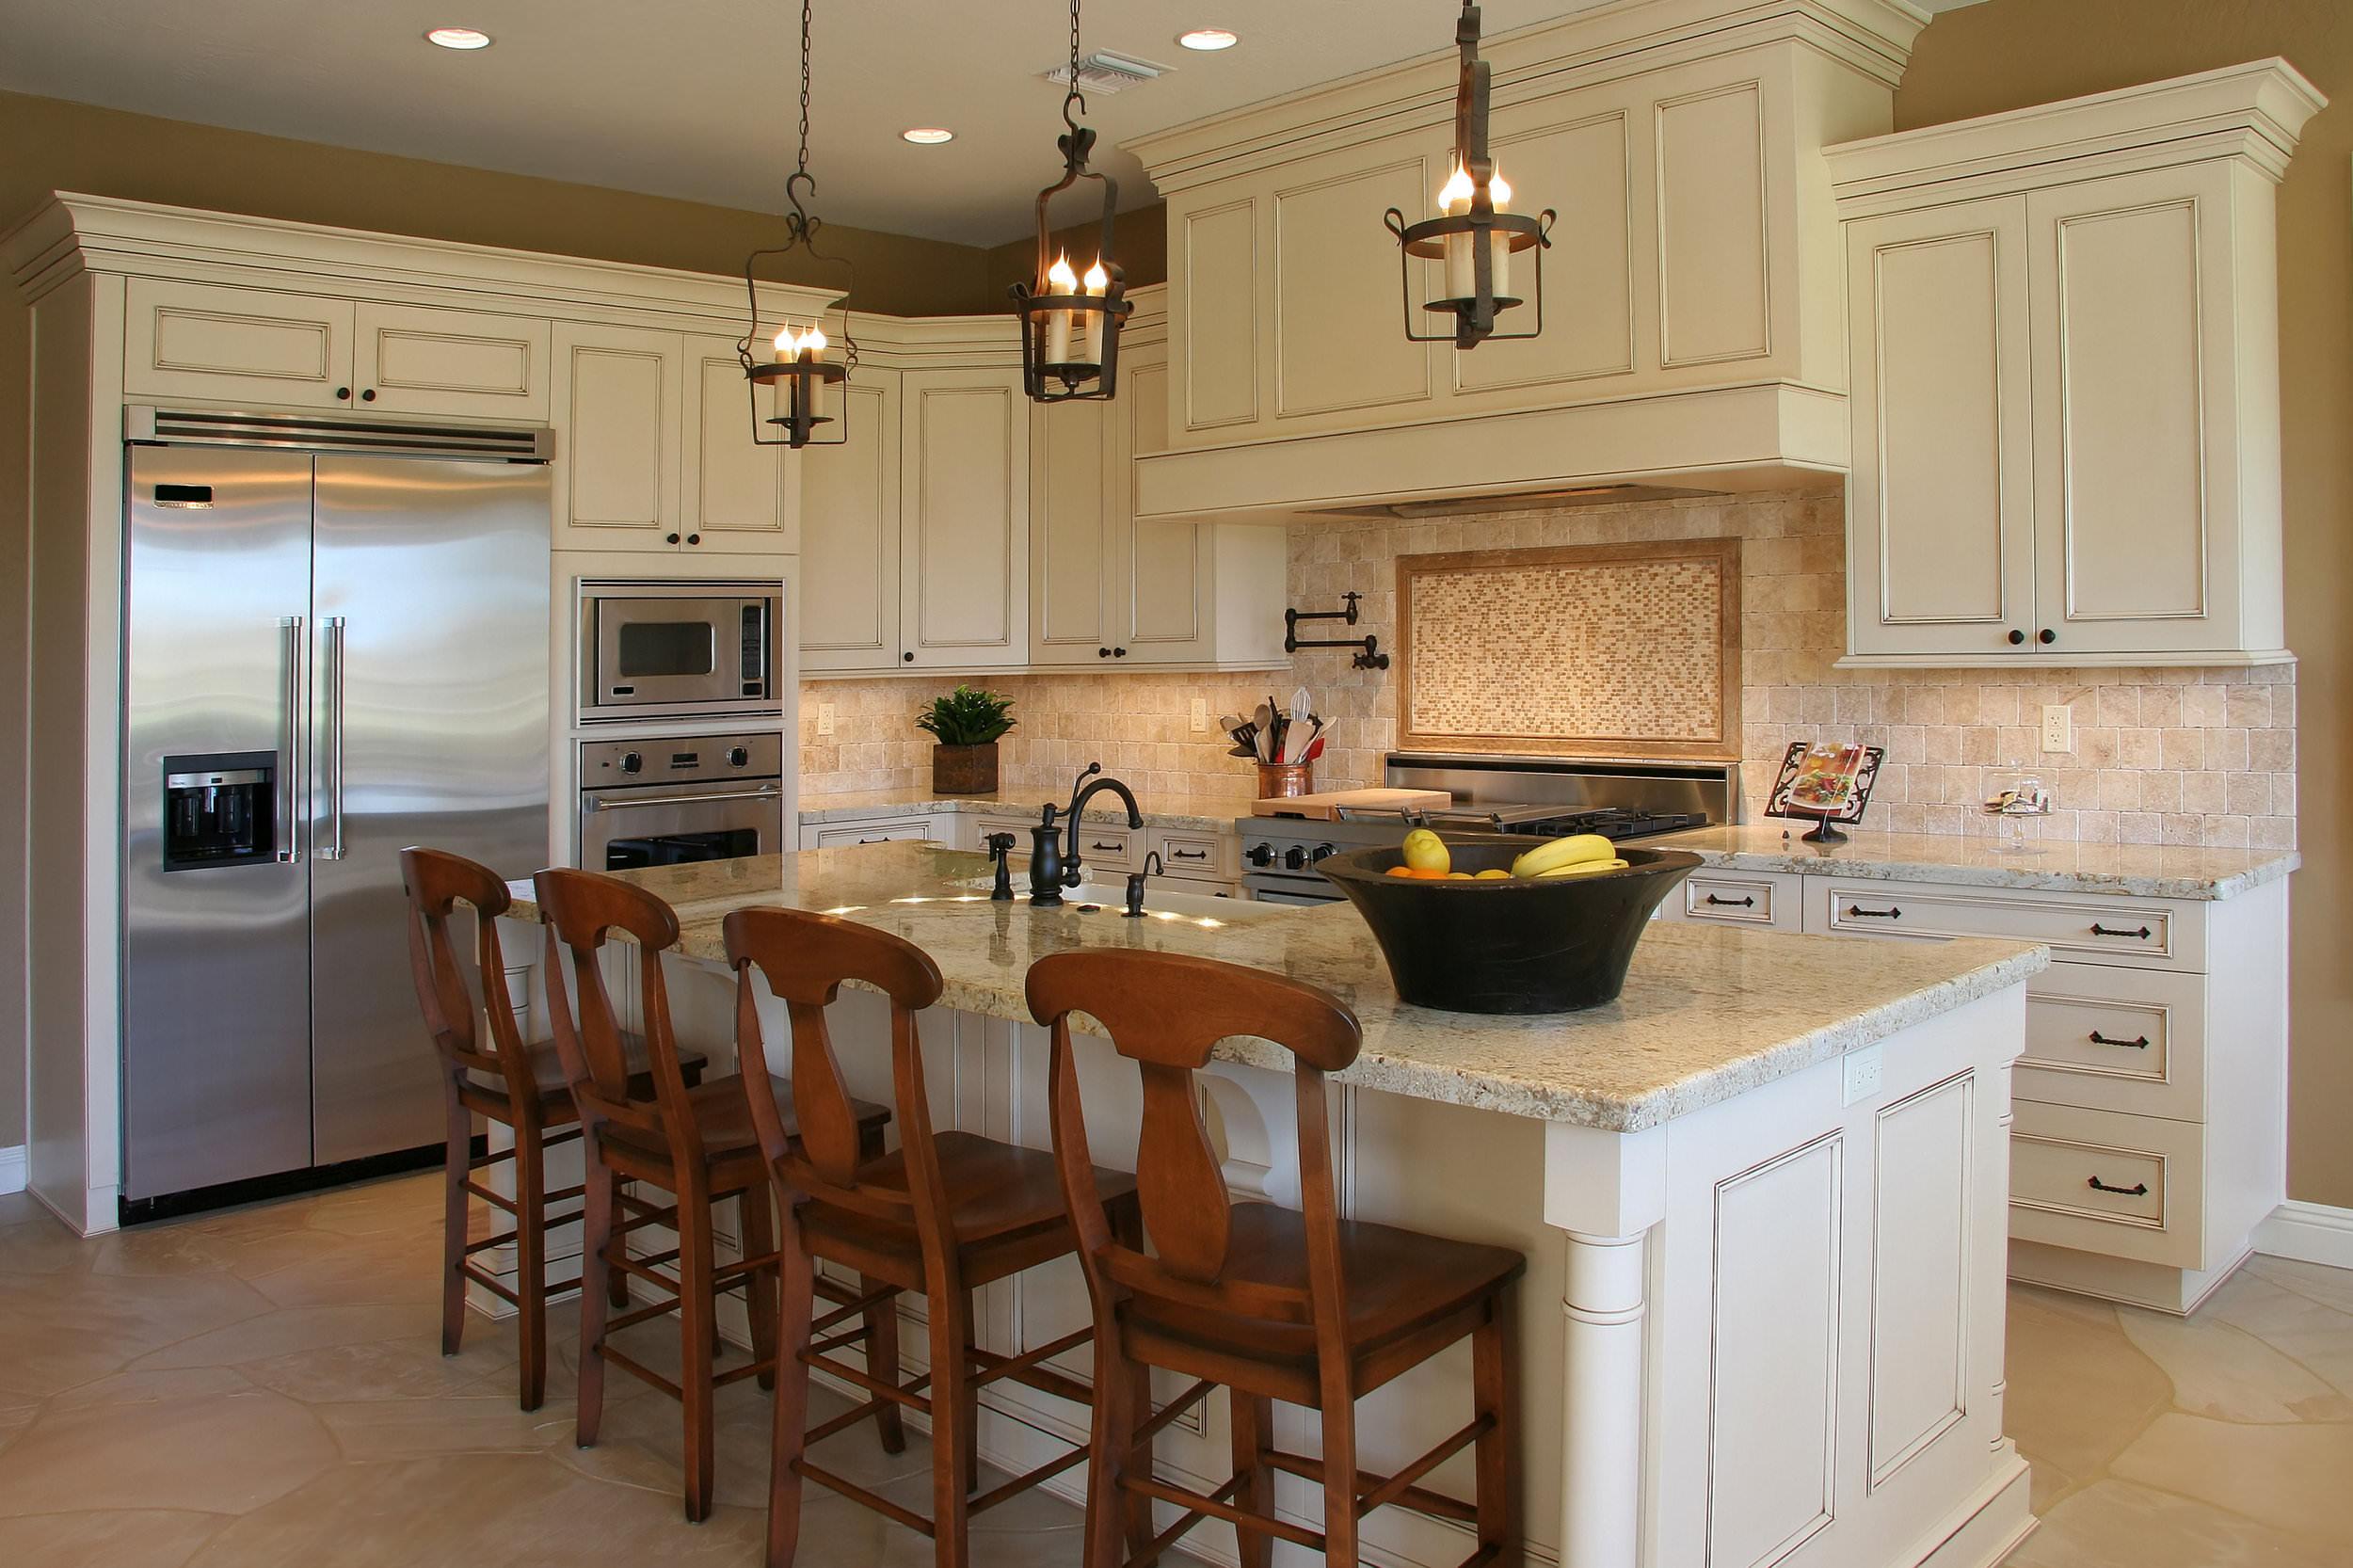 Kitchen remodel Southern California